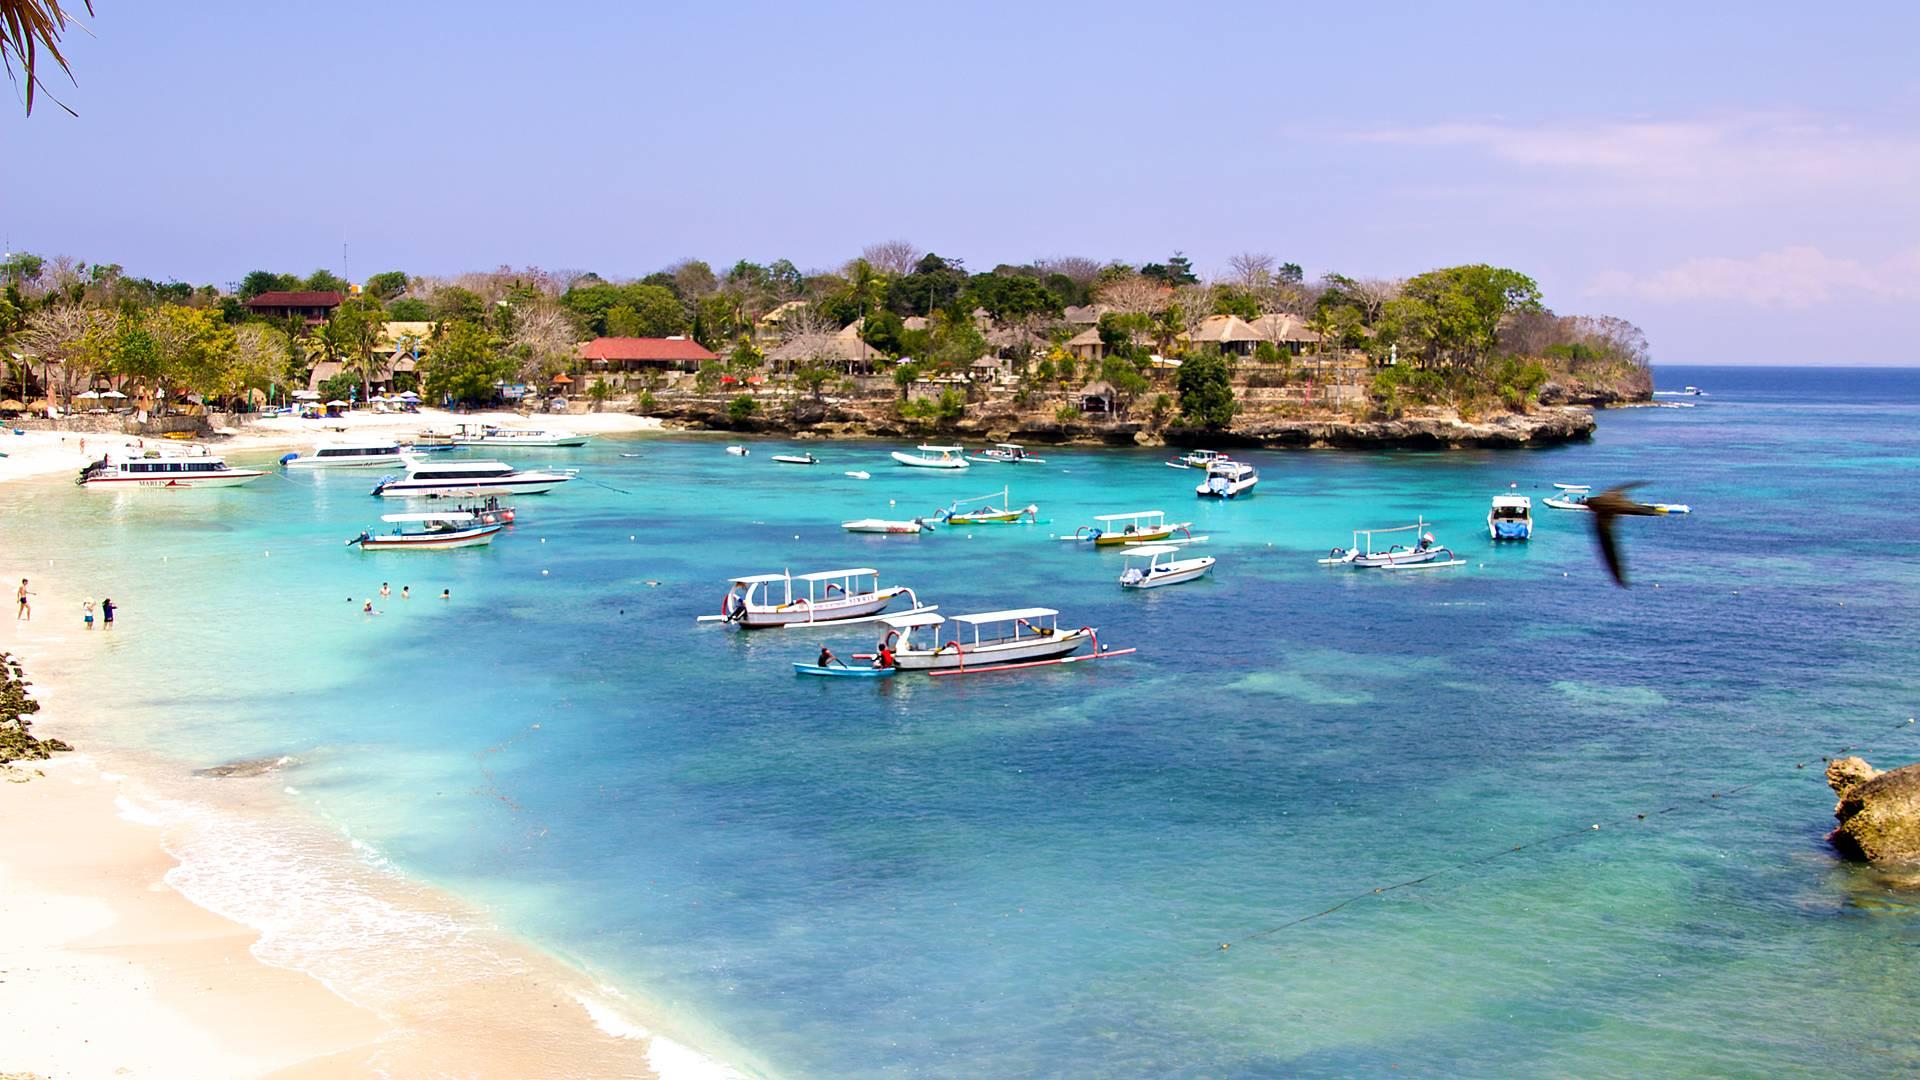 Immersione tra natura e villaggi balinesi e mare a Nusa Lembonga